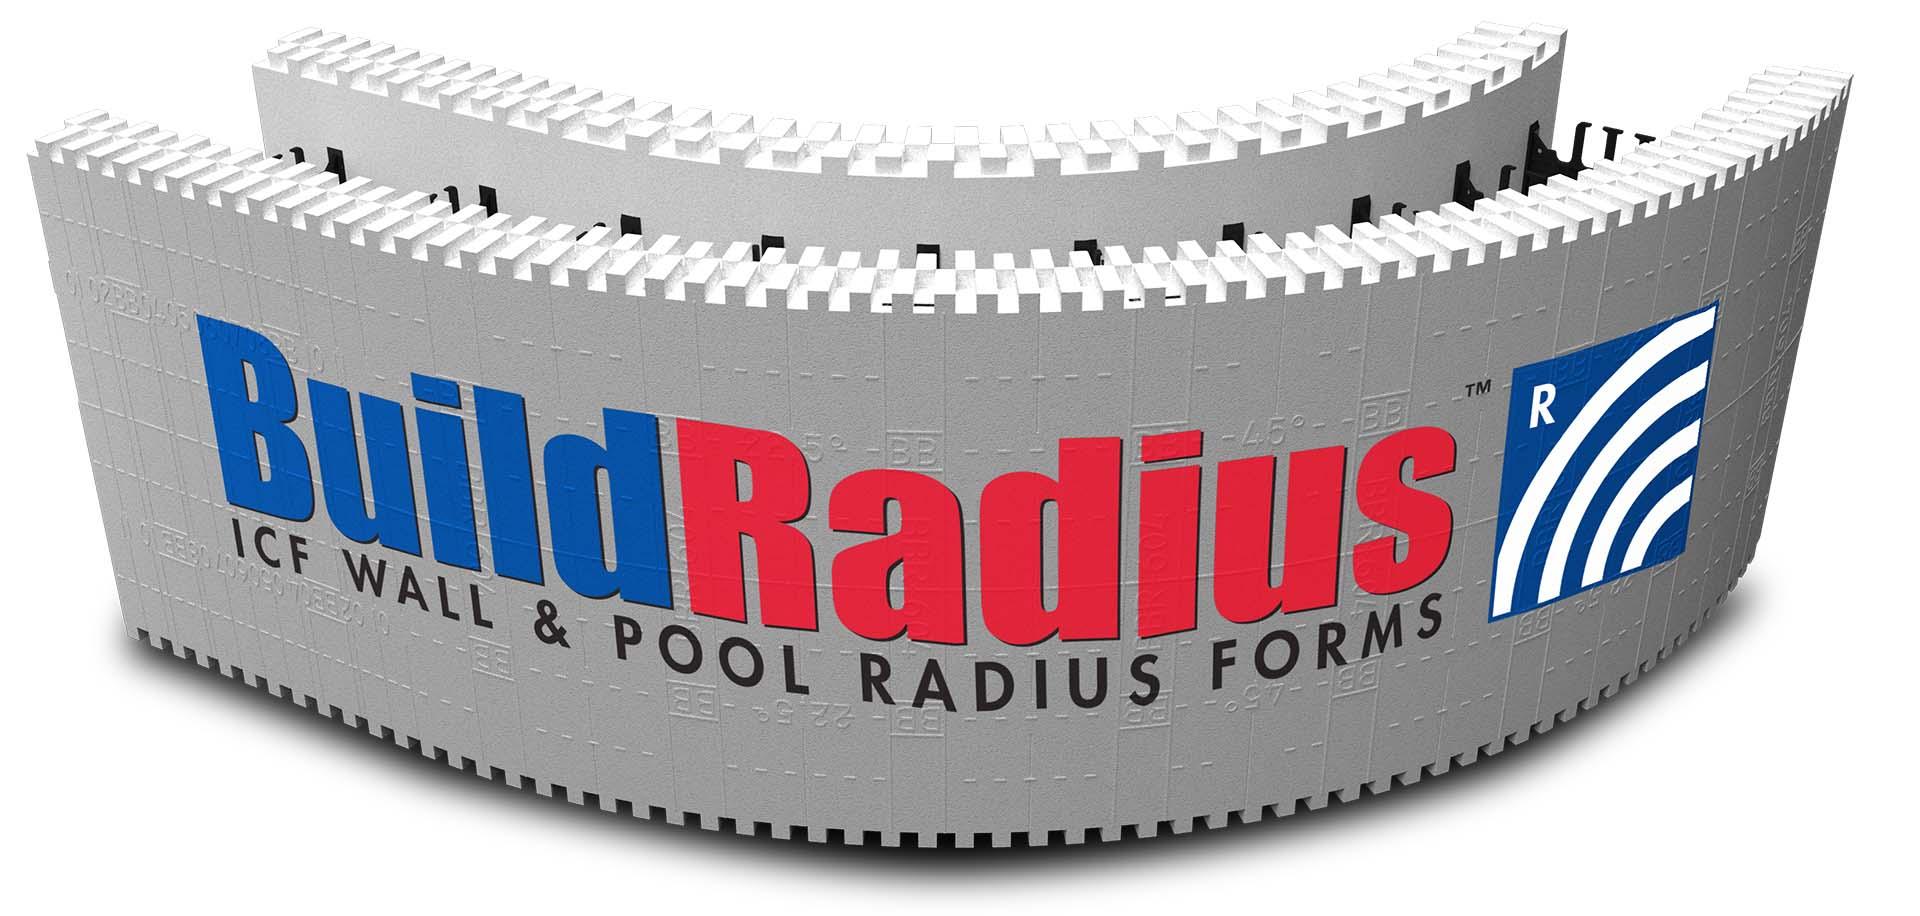 BuildRadius 4 Foot Radius Block